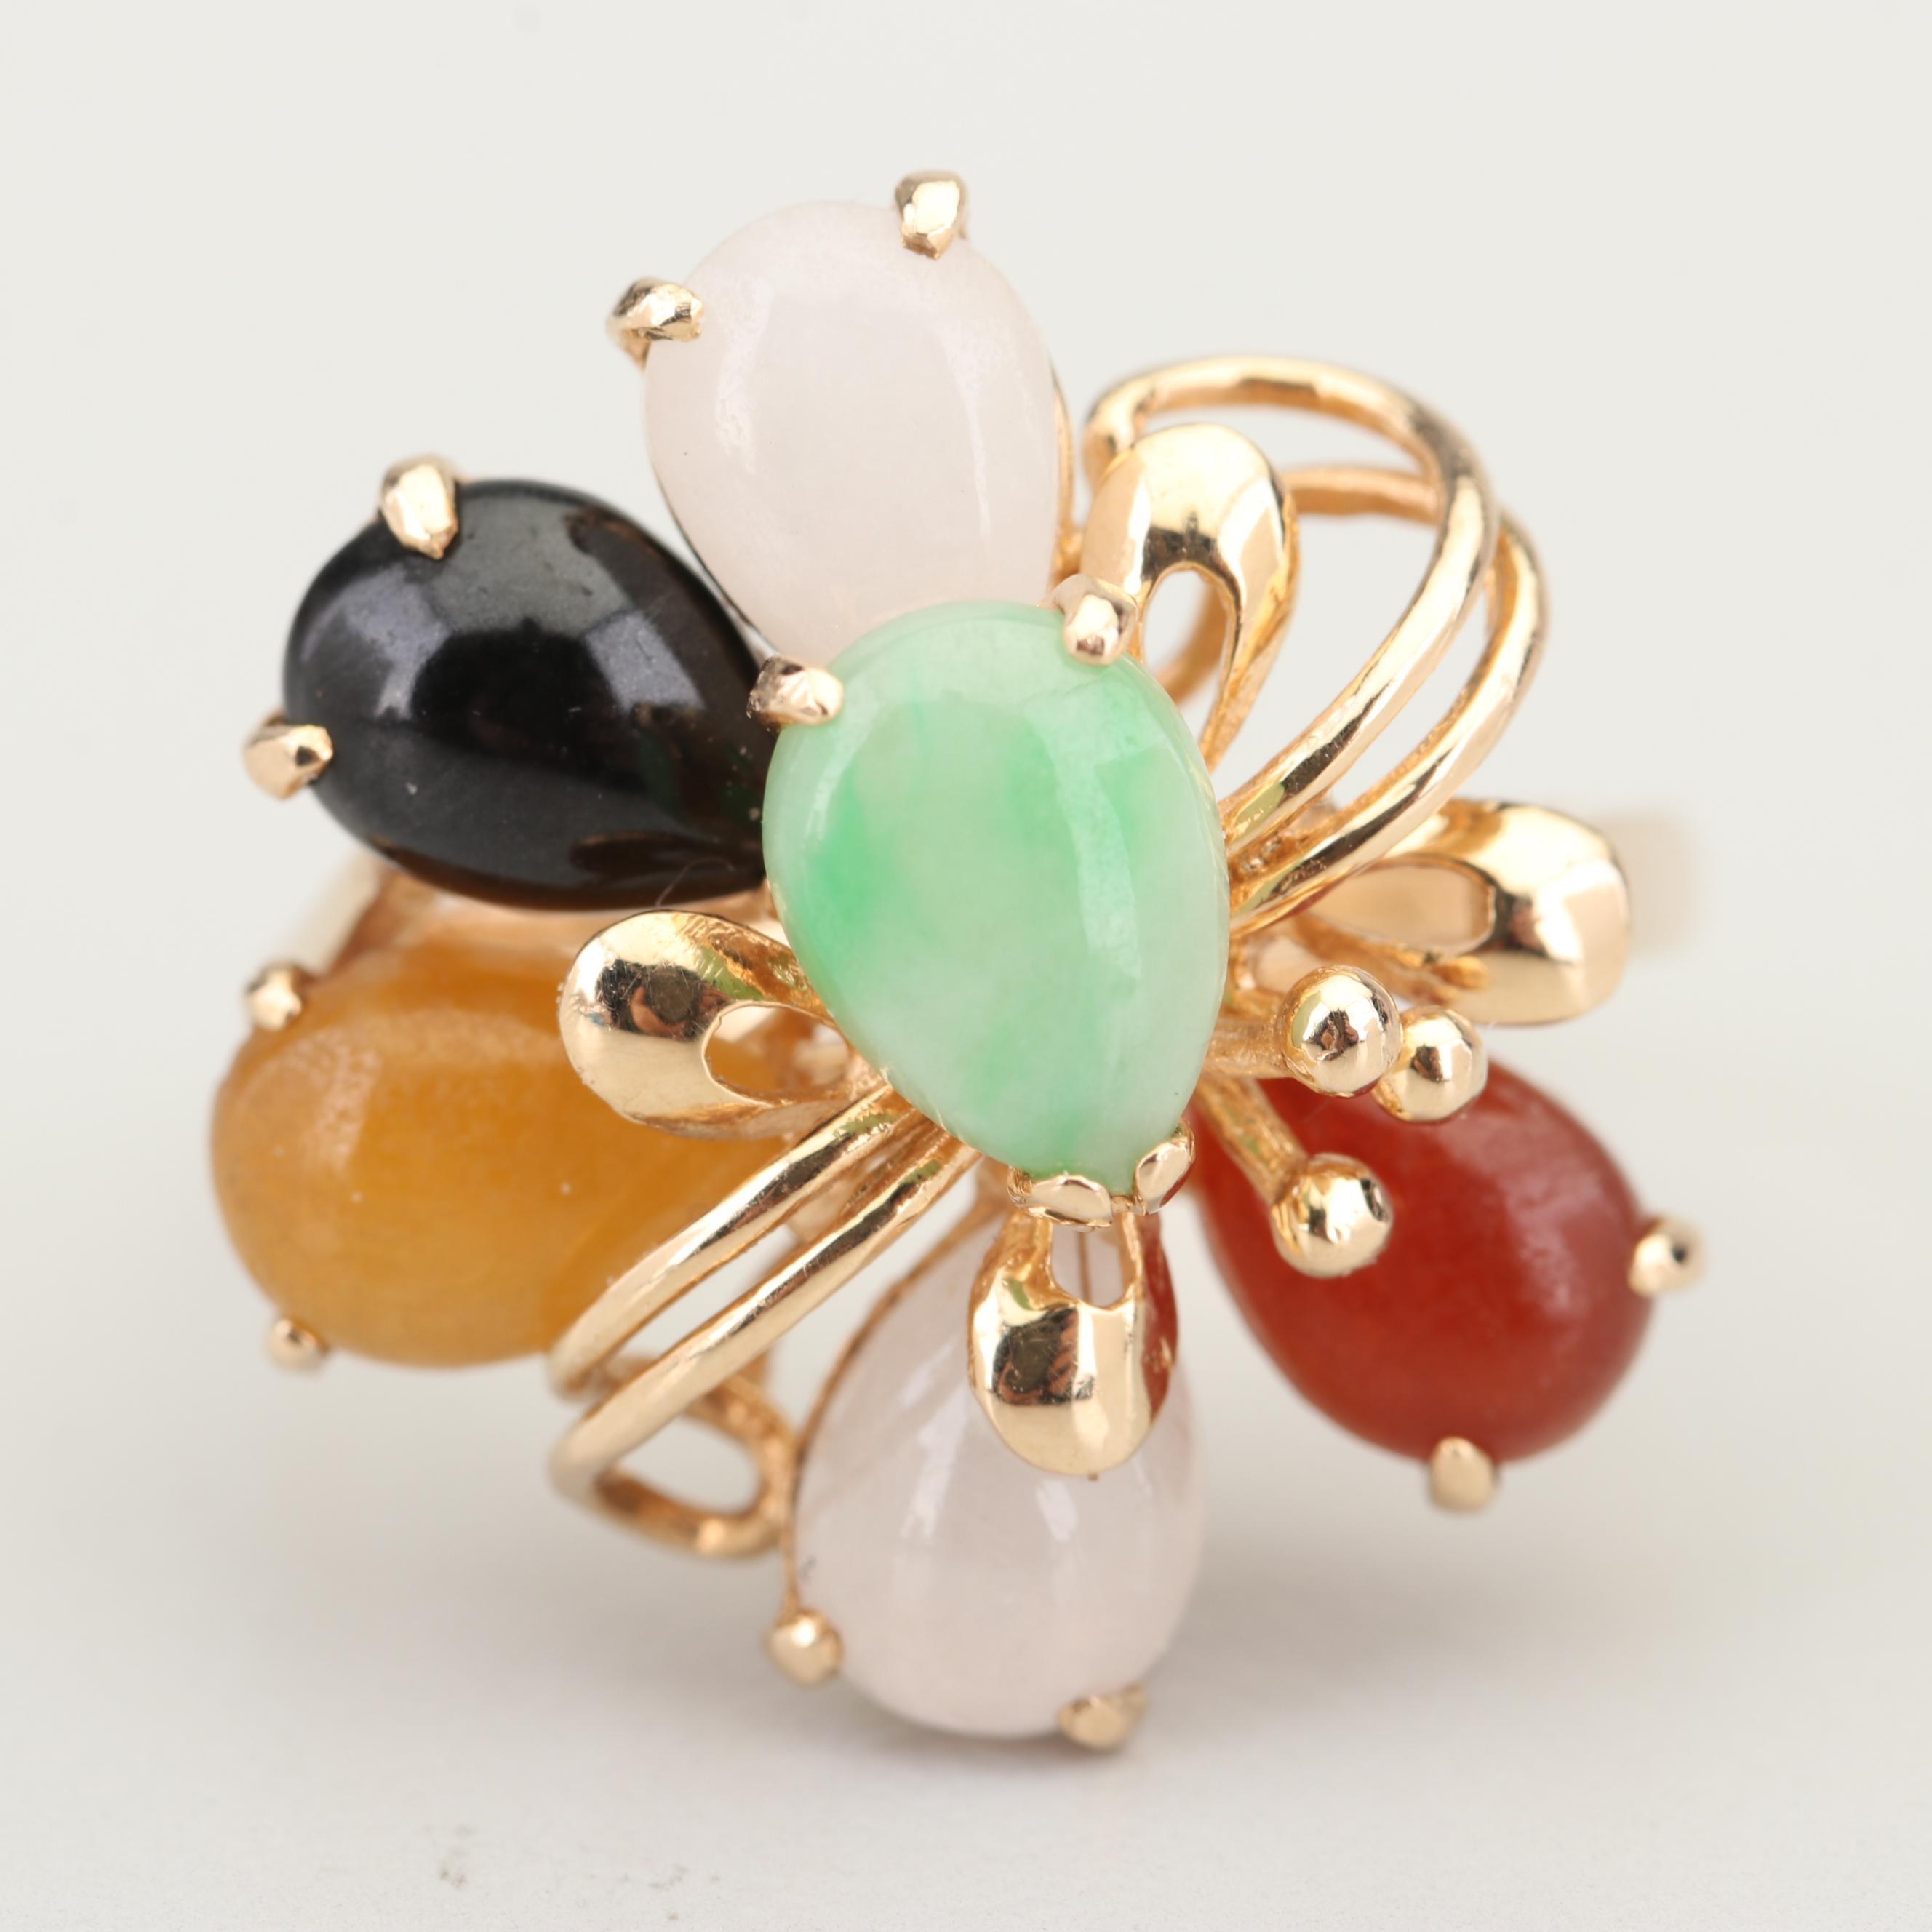 14K Yellow Gold Multi-Colored Jadeite Ring